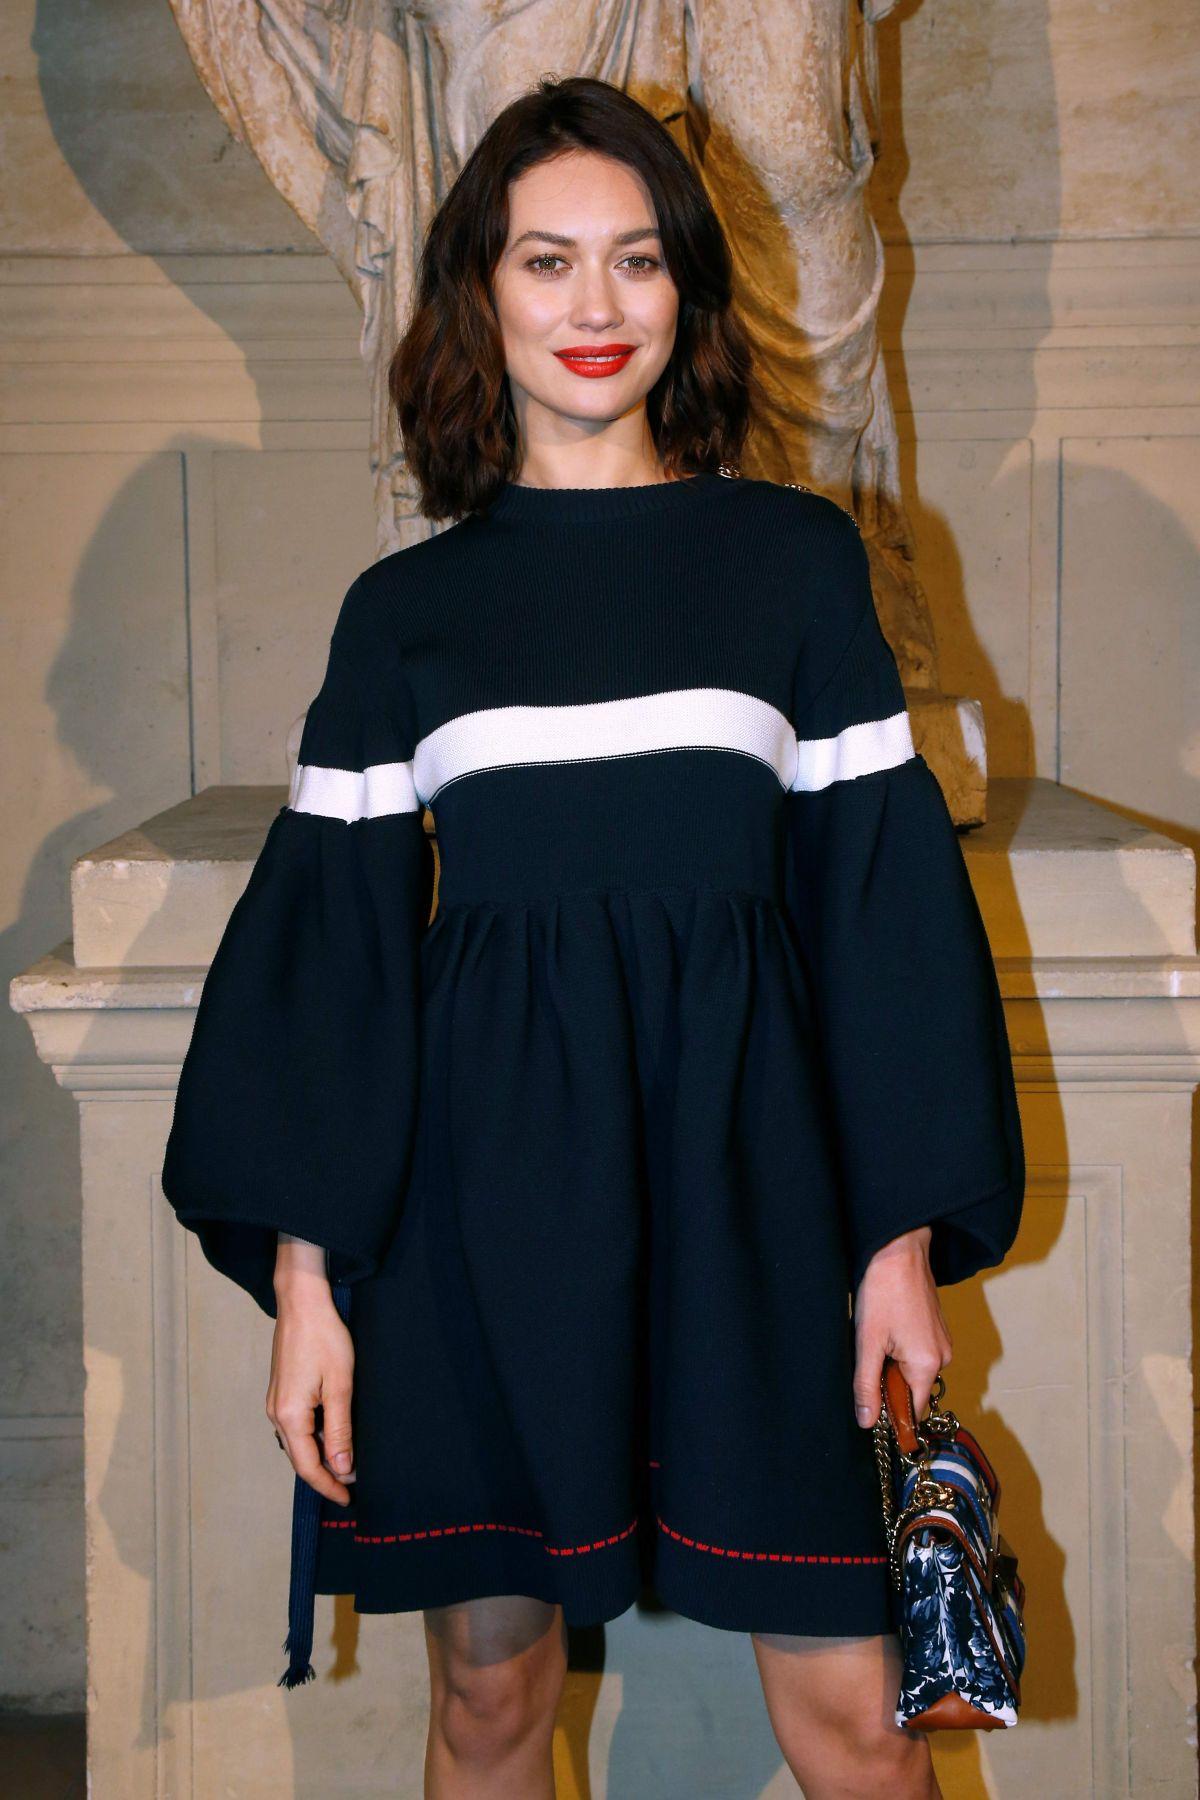 OLGA KURYLENKO at Sonia Rykiel Fashion Show in Paris 03/04/2017